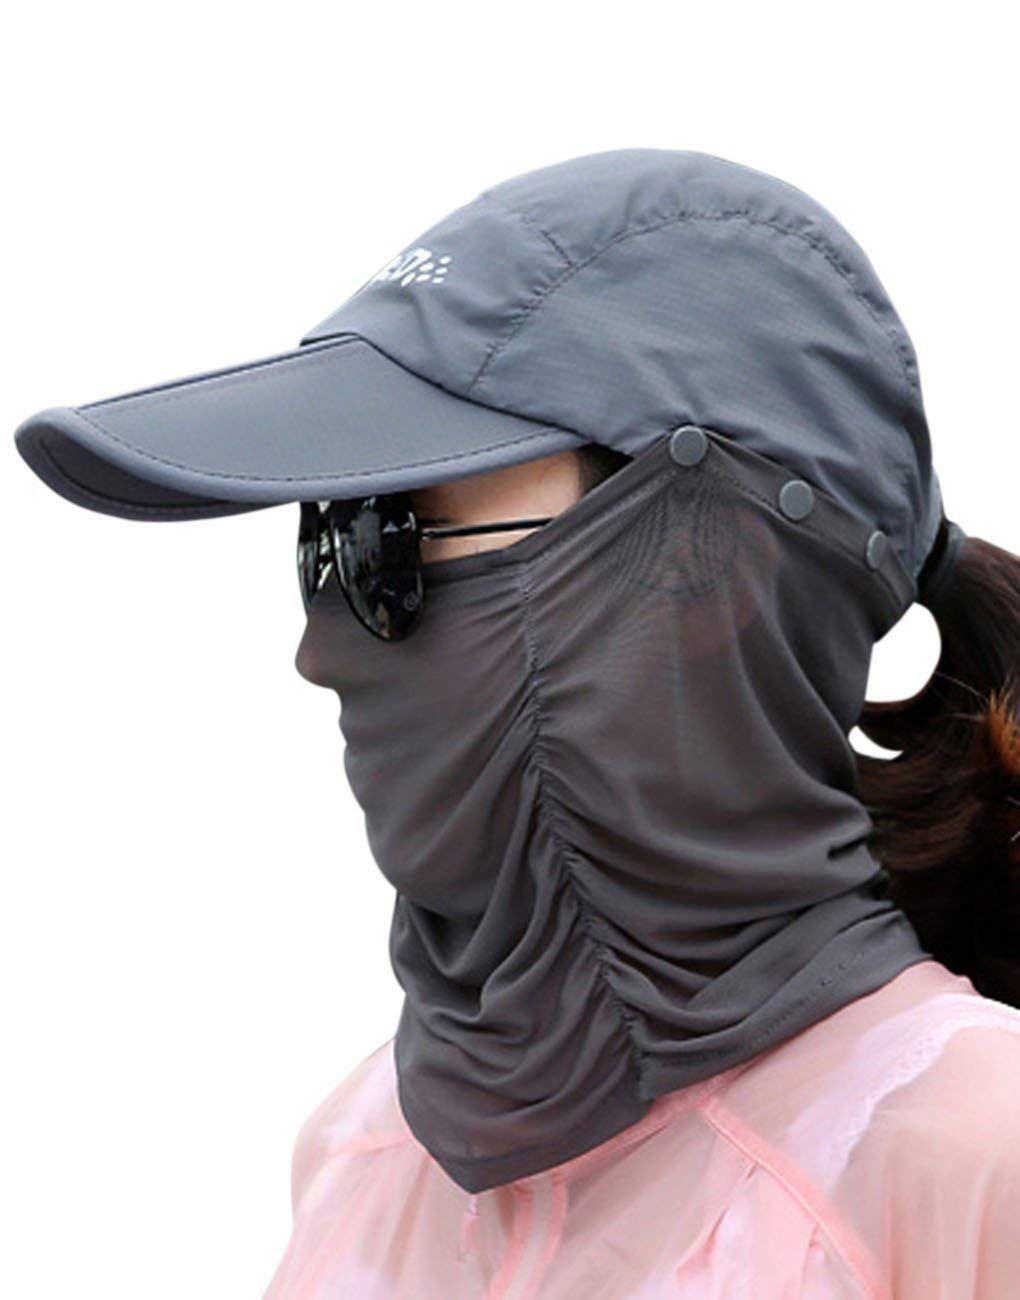 Sun Hats 2 In 1 Anti Uv Sun Protection Foldable Wide Brim Visor Removable Gauze Mask Outdoor Sun Hat Cap Lightwei Sun Hats Wide Brim Sun Hat Sun Hats For Women